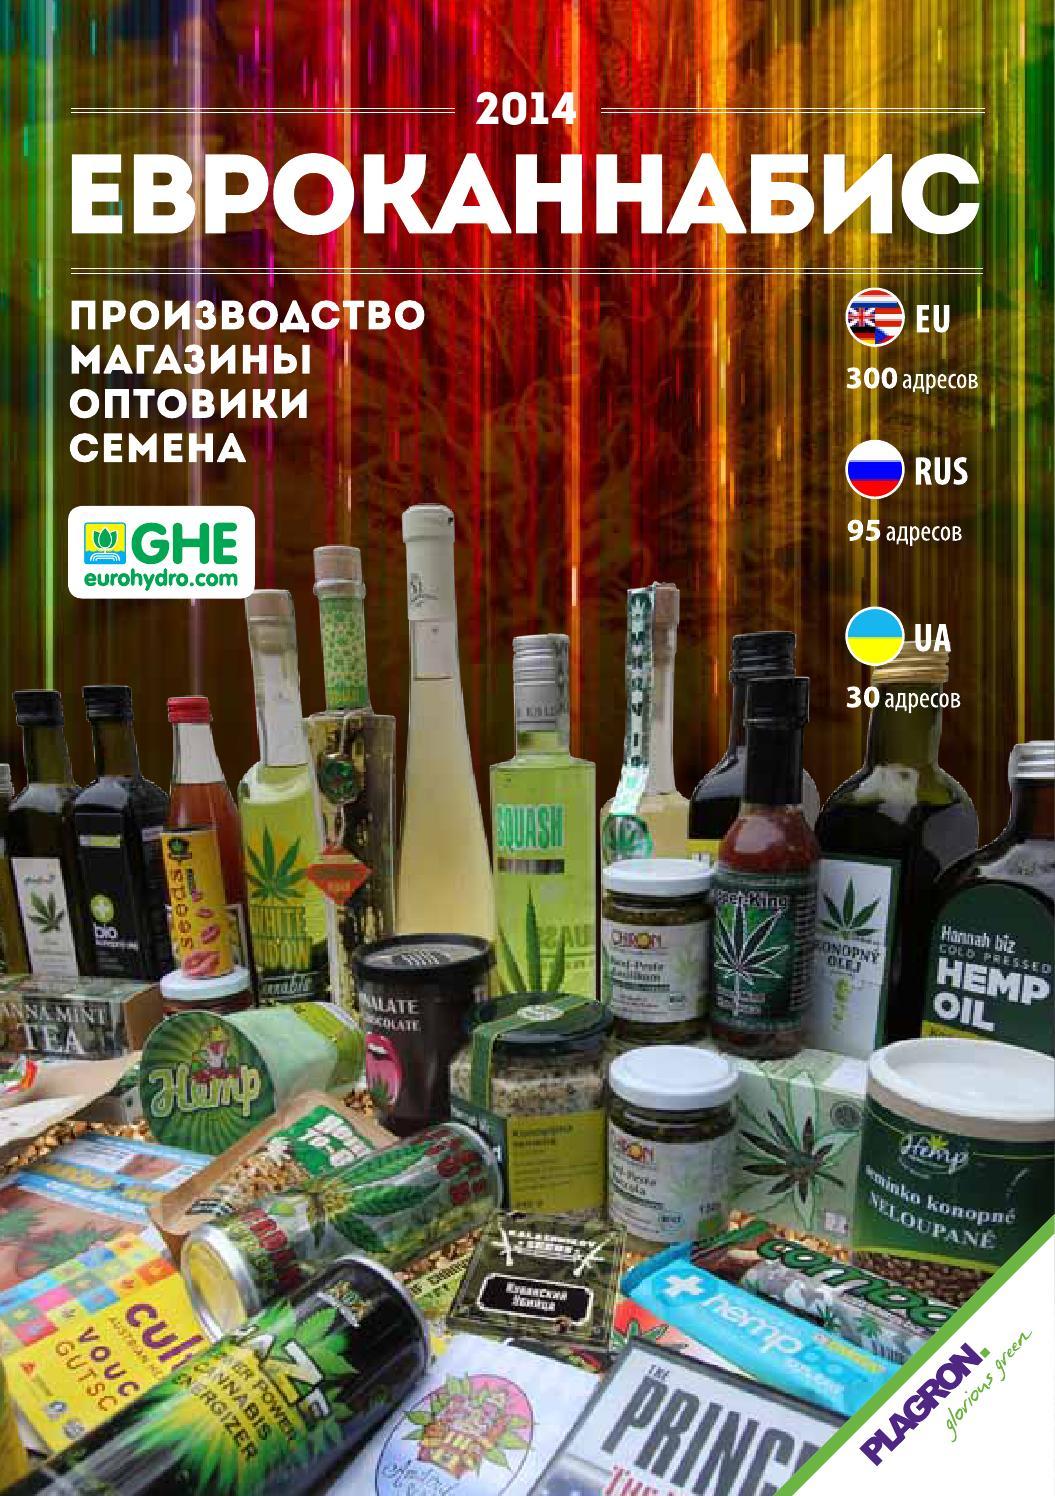 Kalashnikov express mix pack feminised seeds - herbies seeds